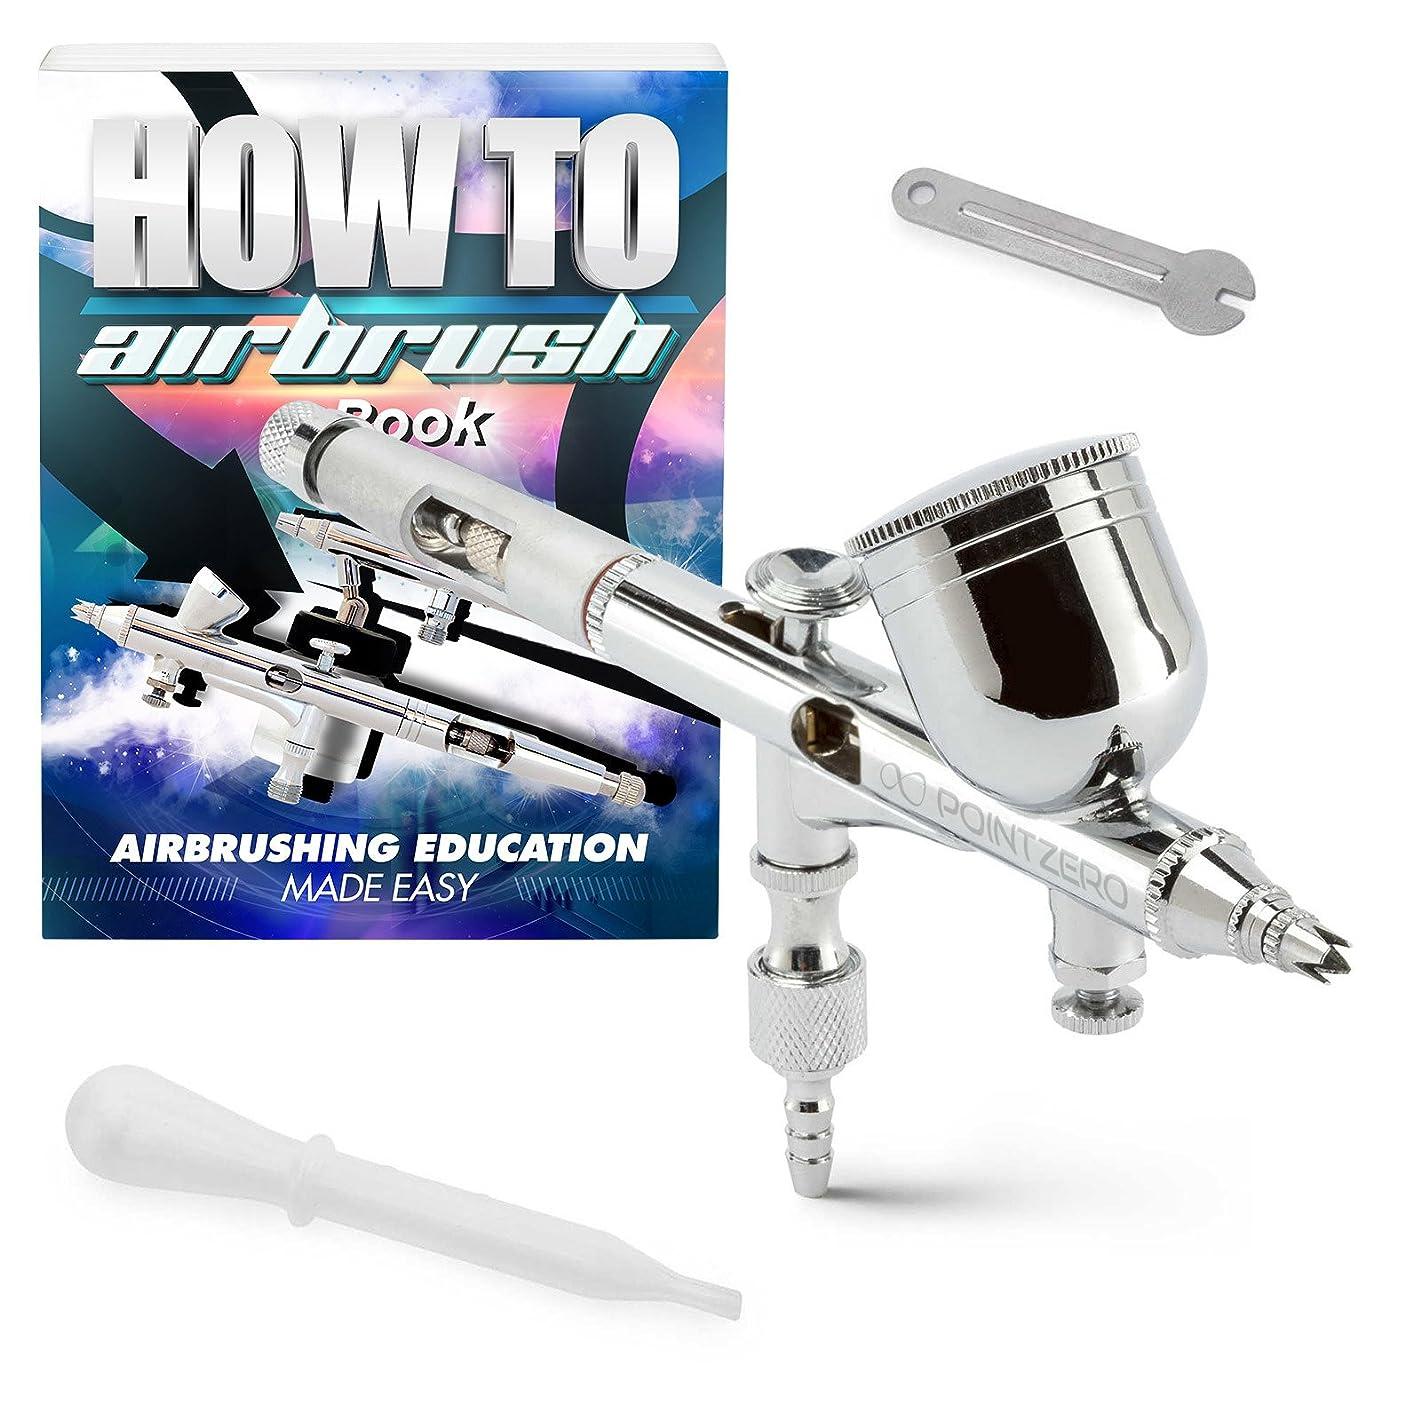 PointZero Dual-Action 9cc Gravity-Feed Airbrush Set w/MAC Valve - .2mm Nozzle